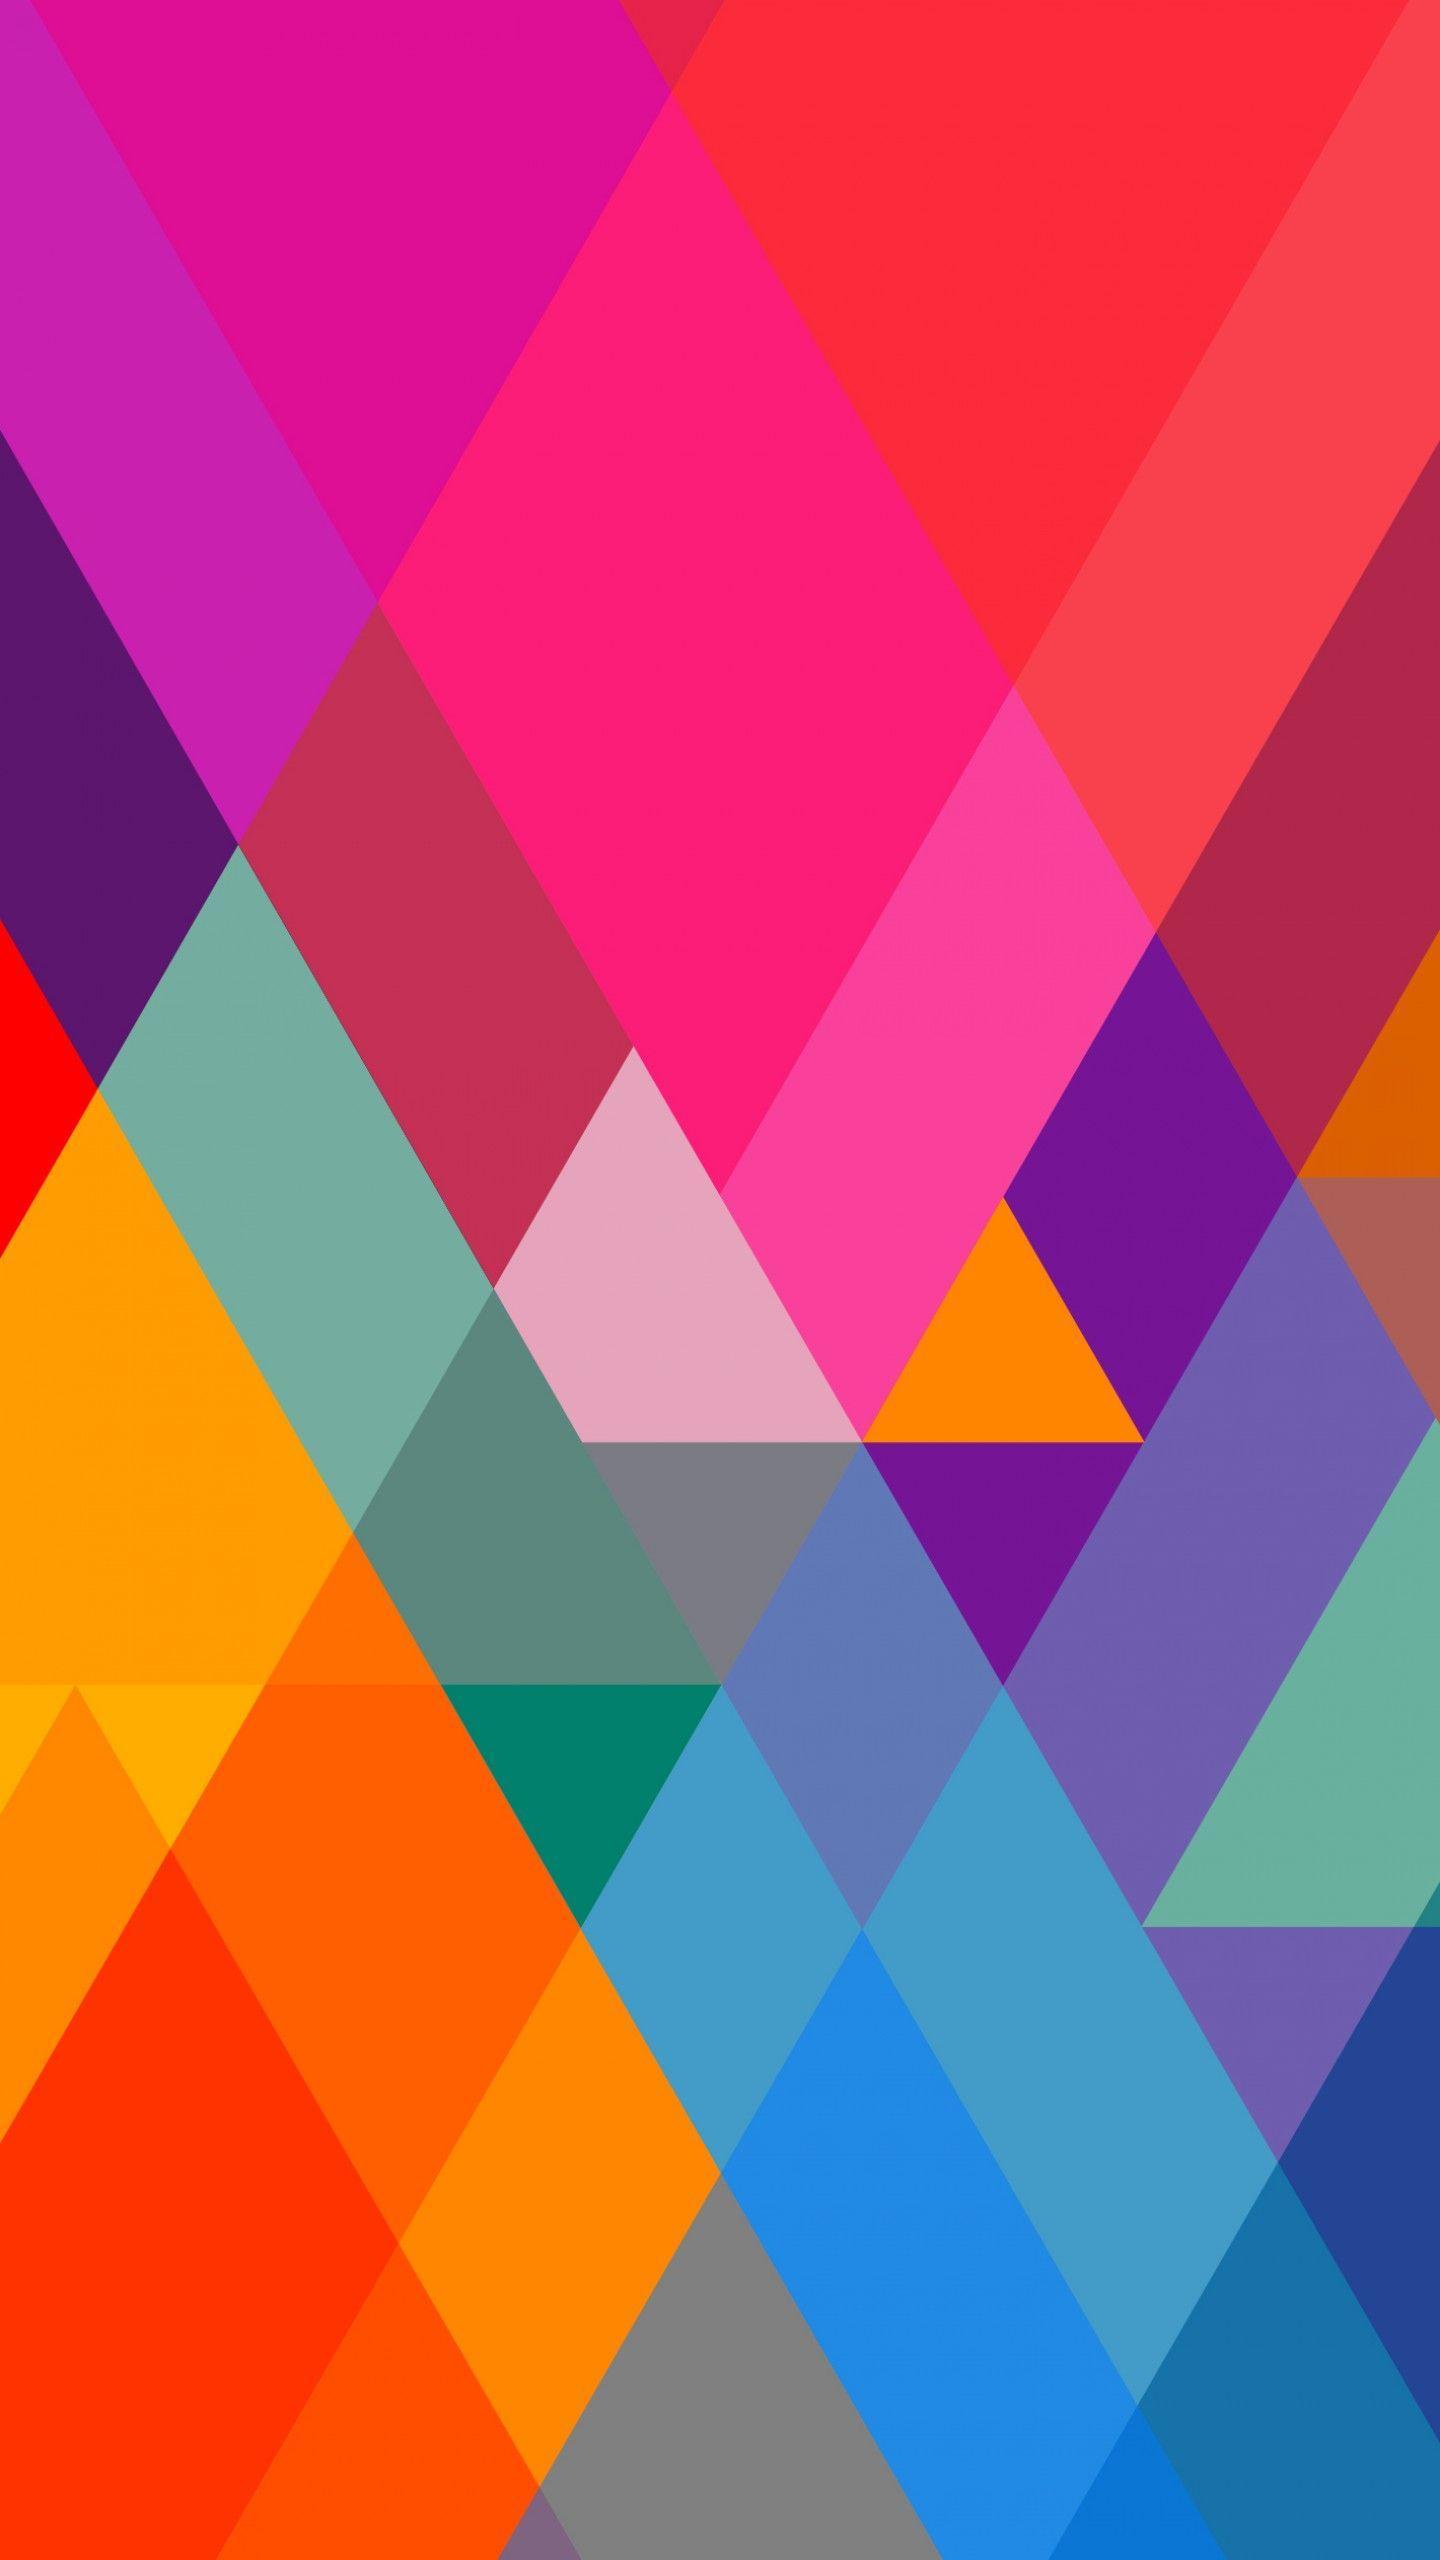 Orange Polygon Wallpapers Top Free Orange Polygon